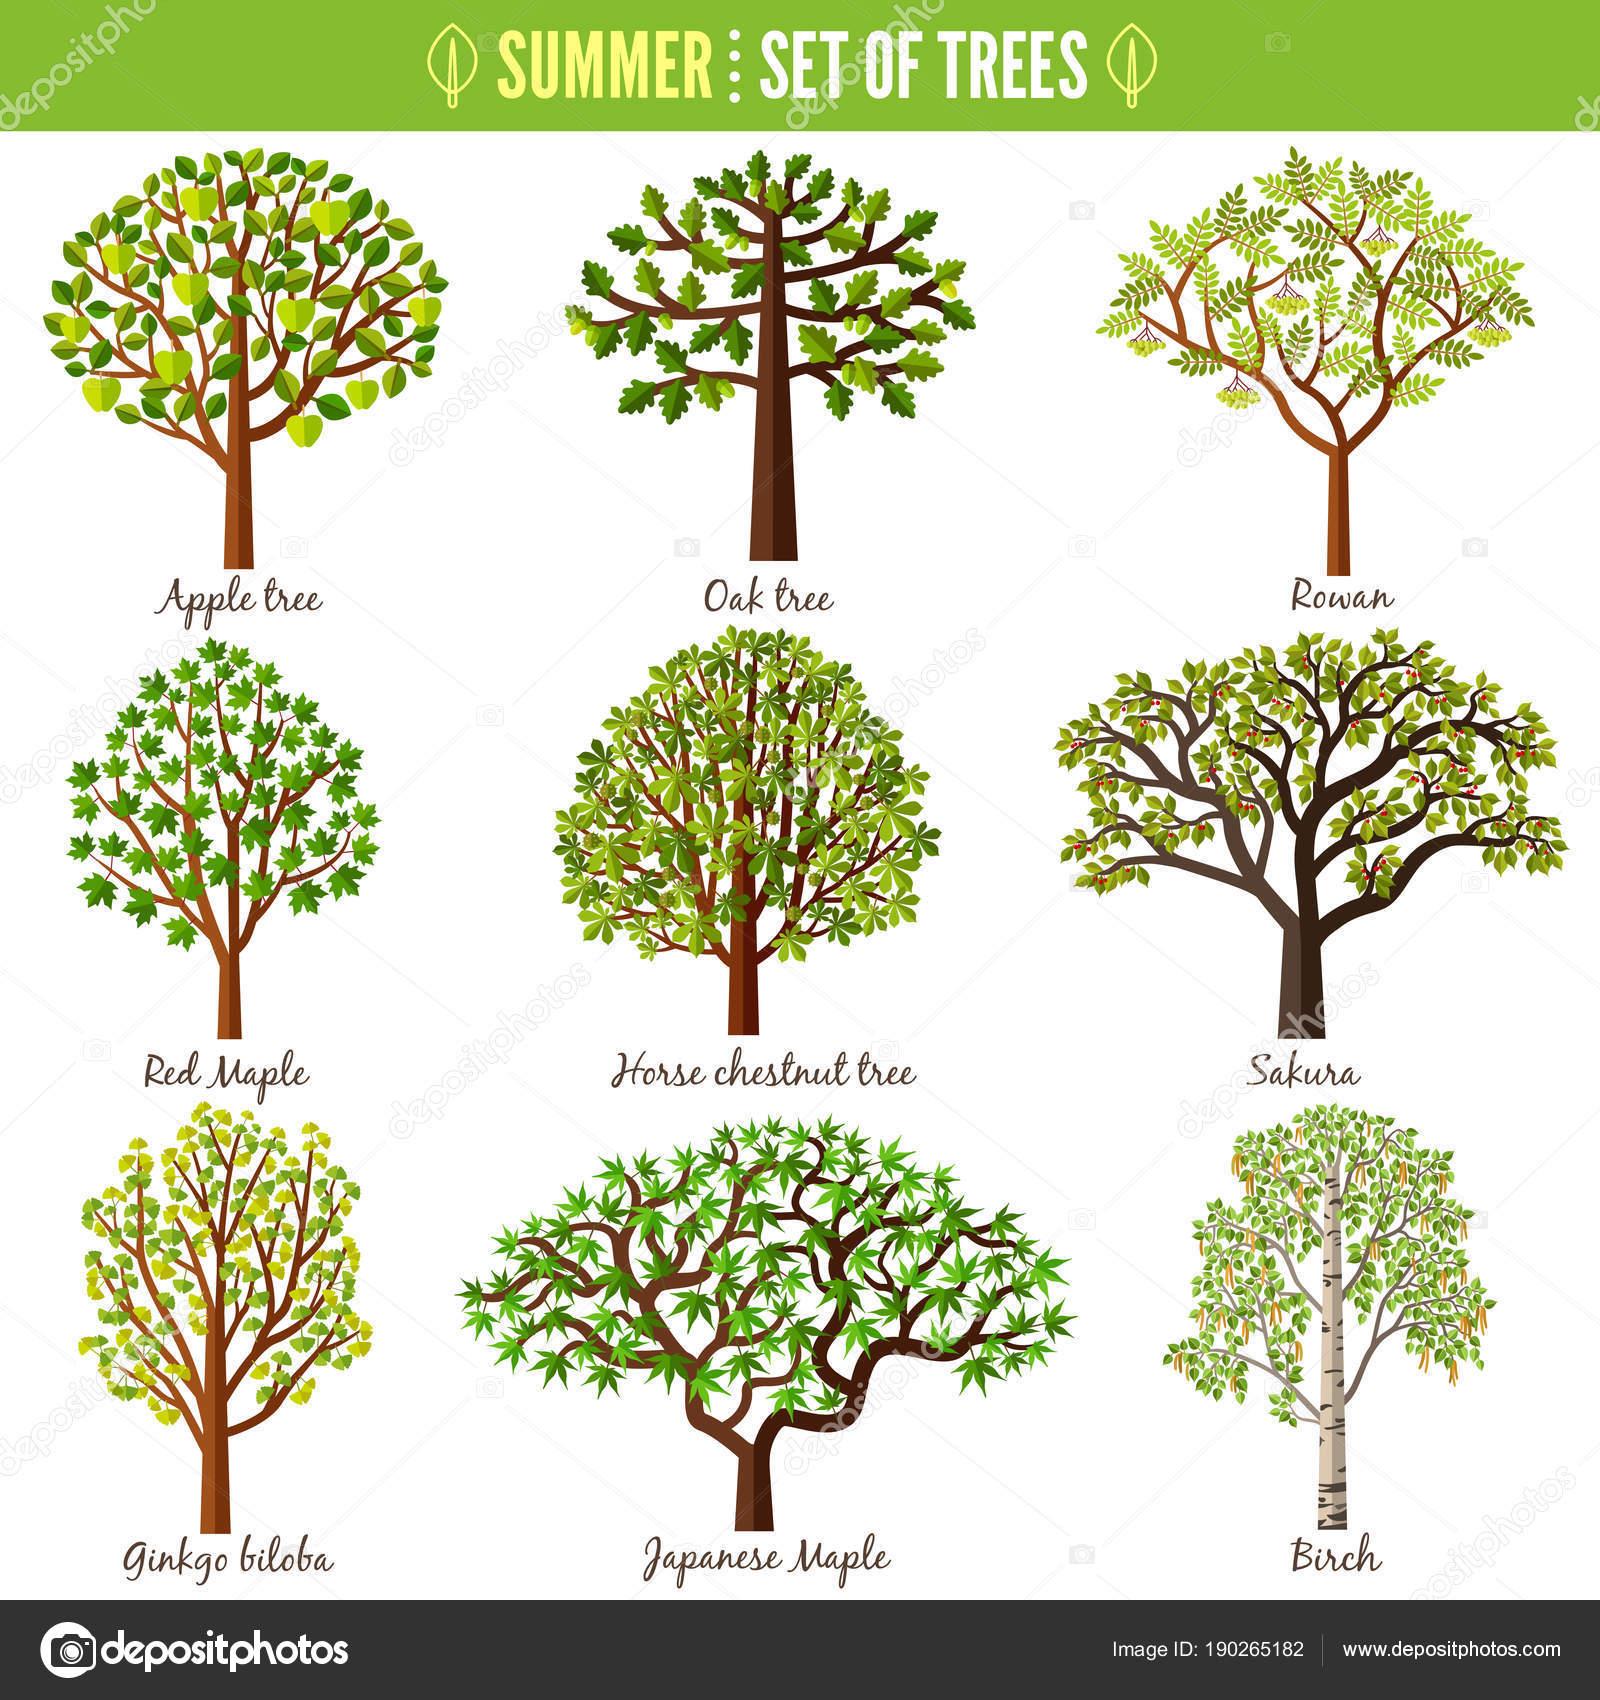 Cherry Blossom Tree Facts Set Summer Trees White Background Apple Tree Oak Tree